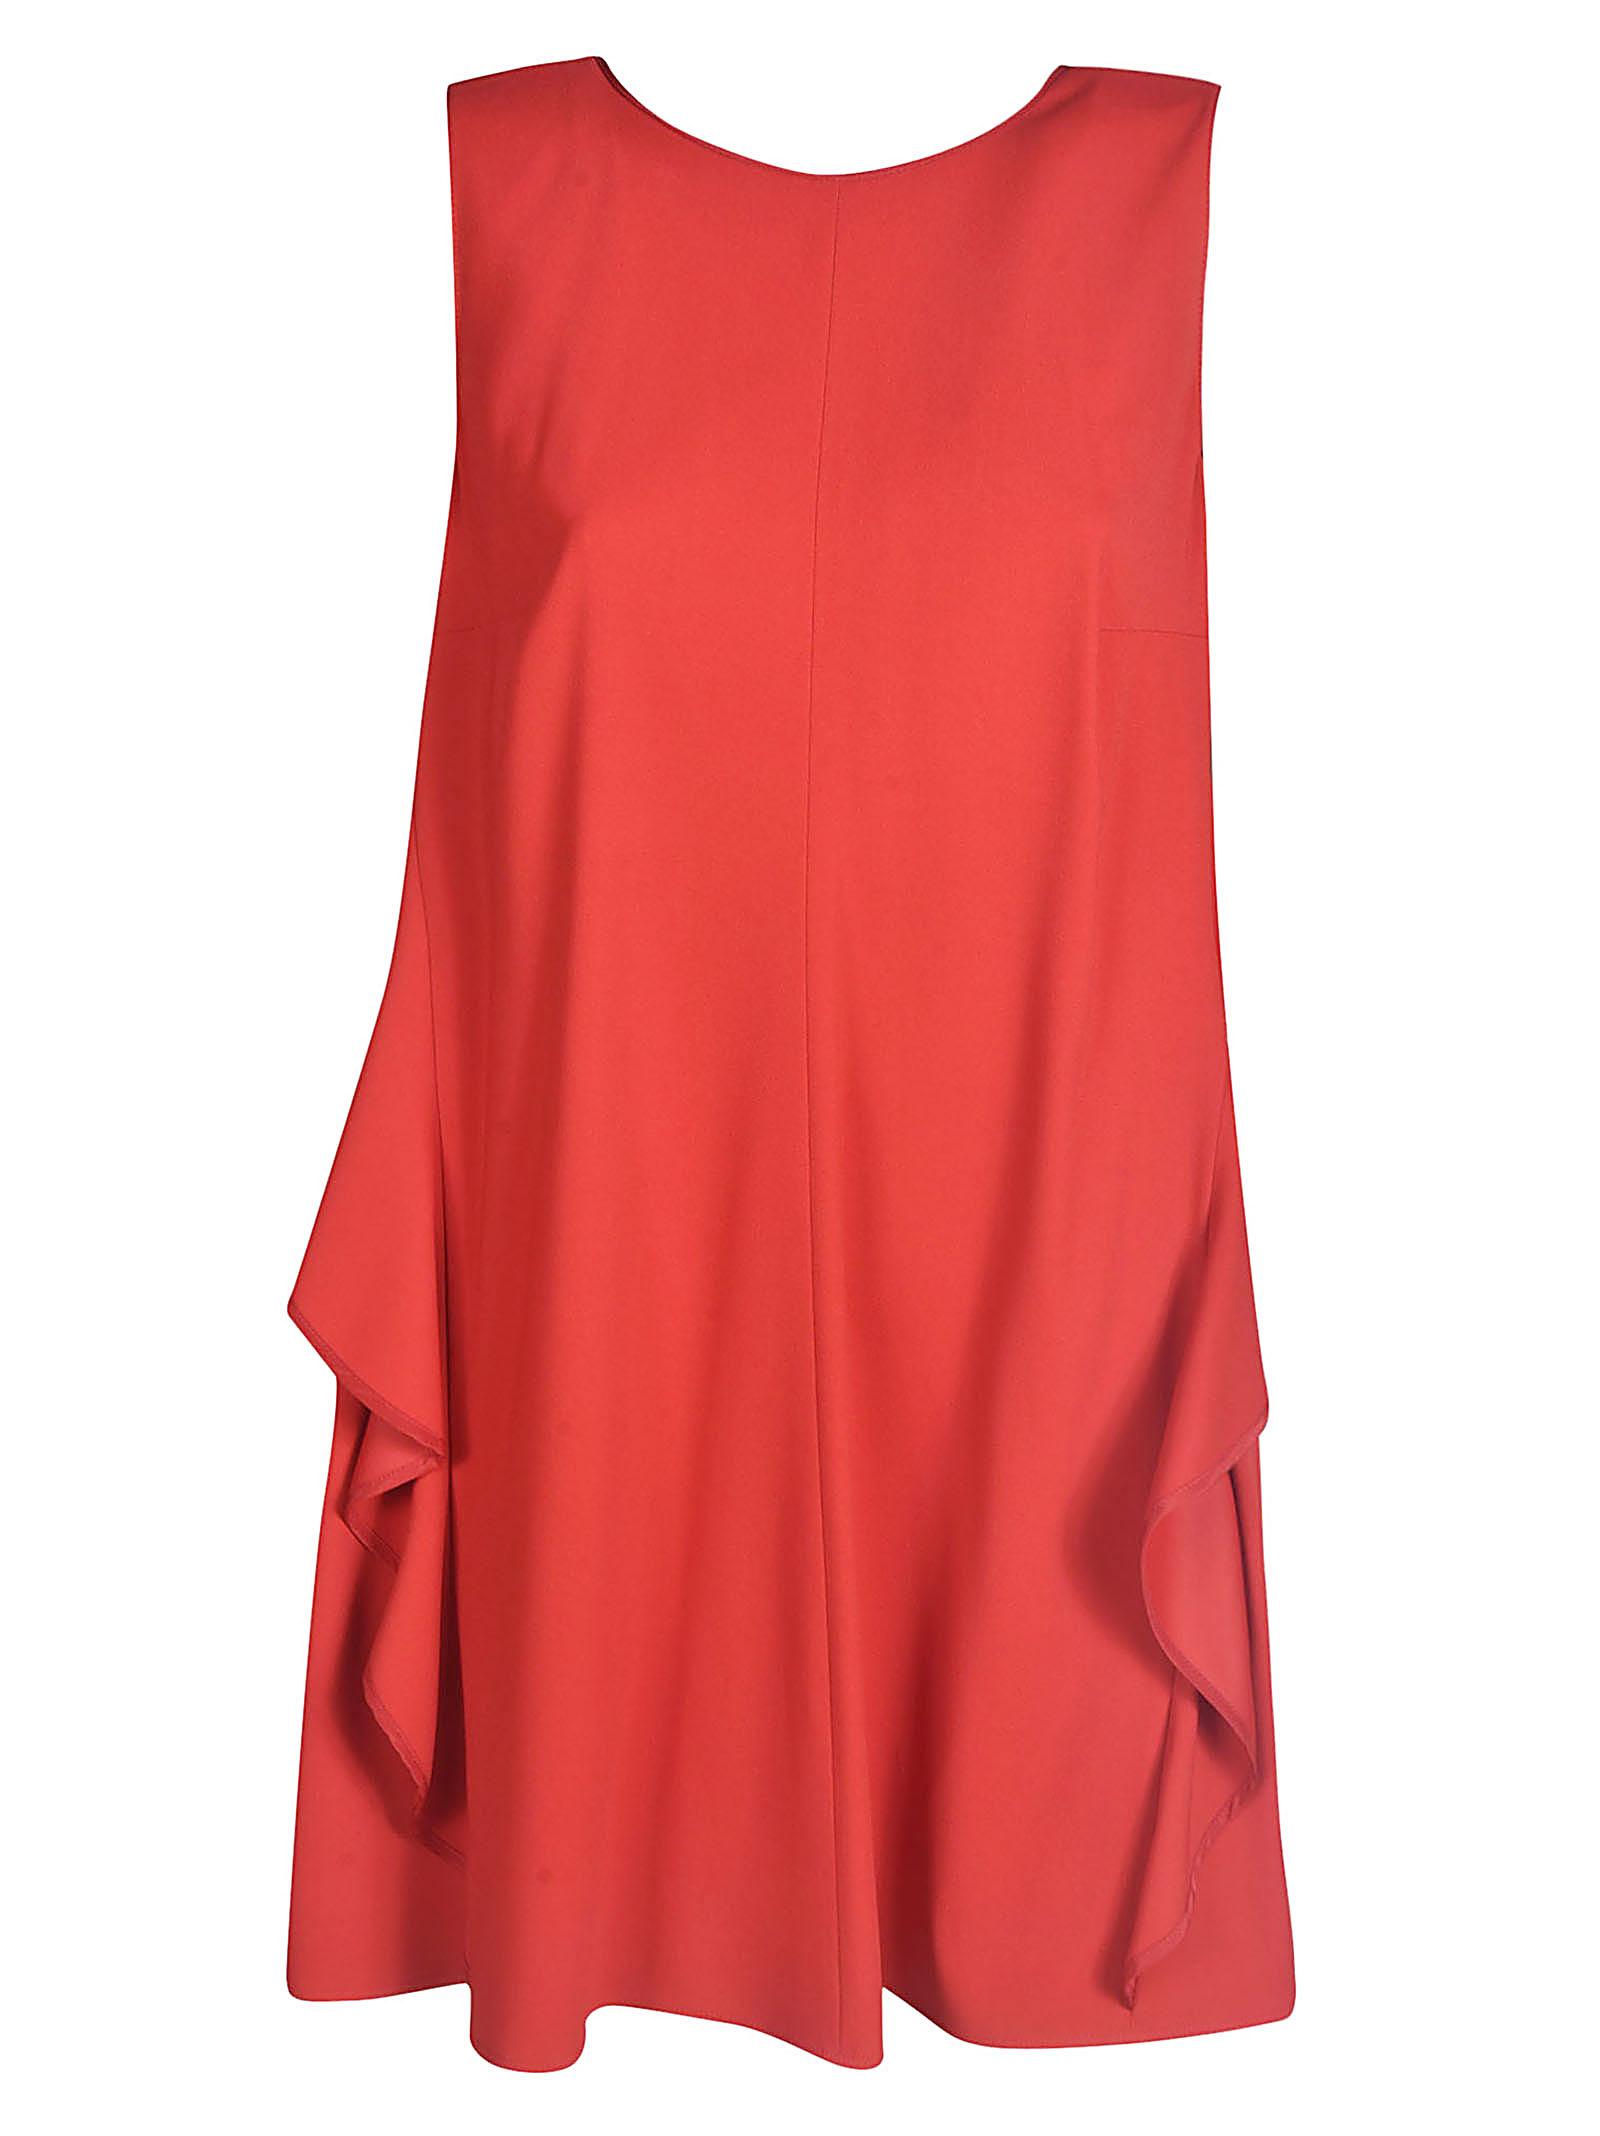 RED Valentino Stretch Cady Dress